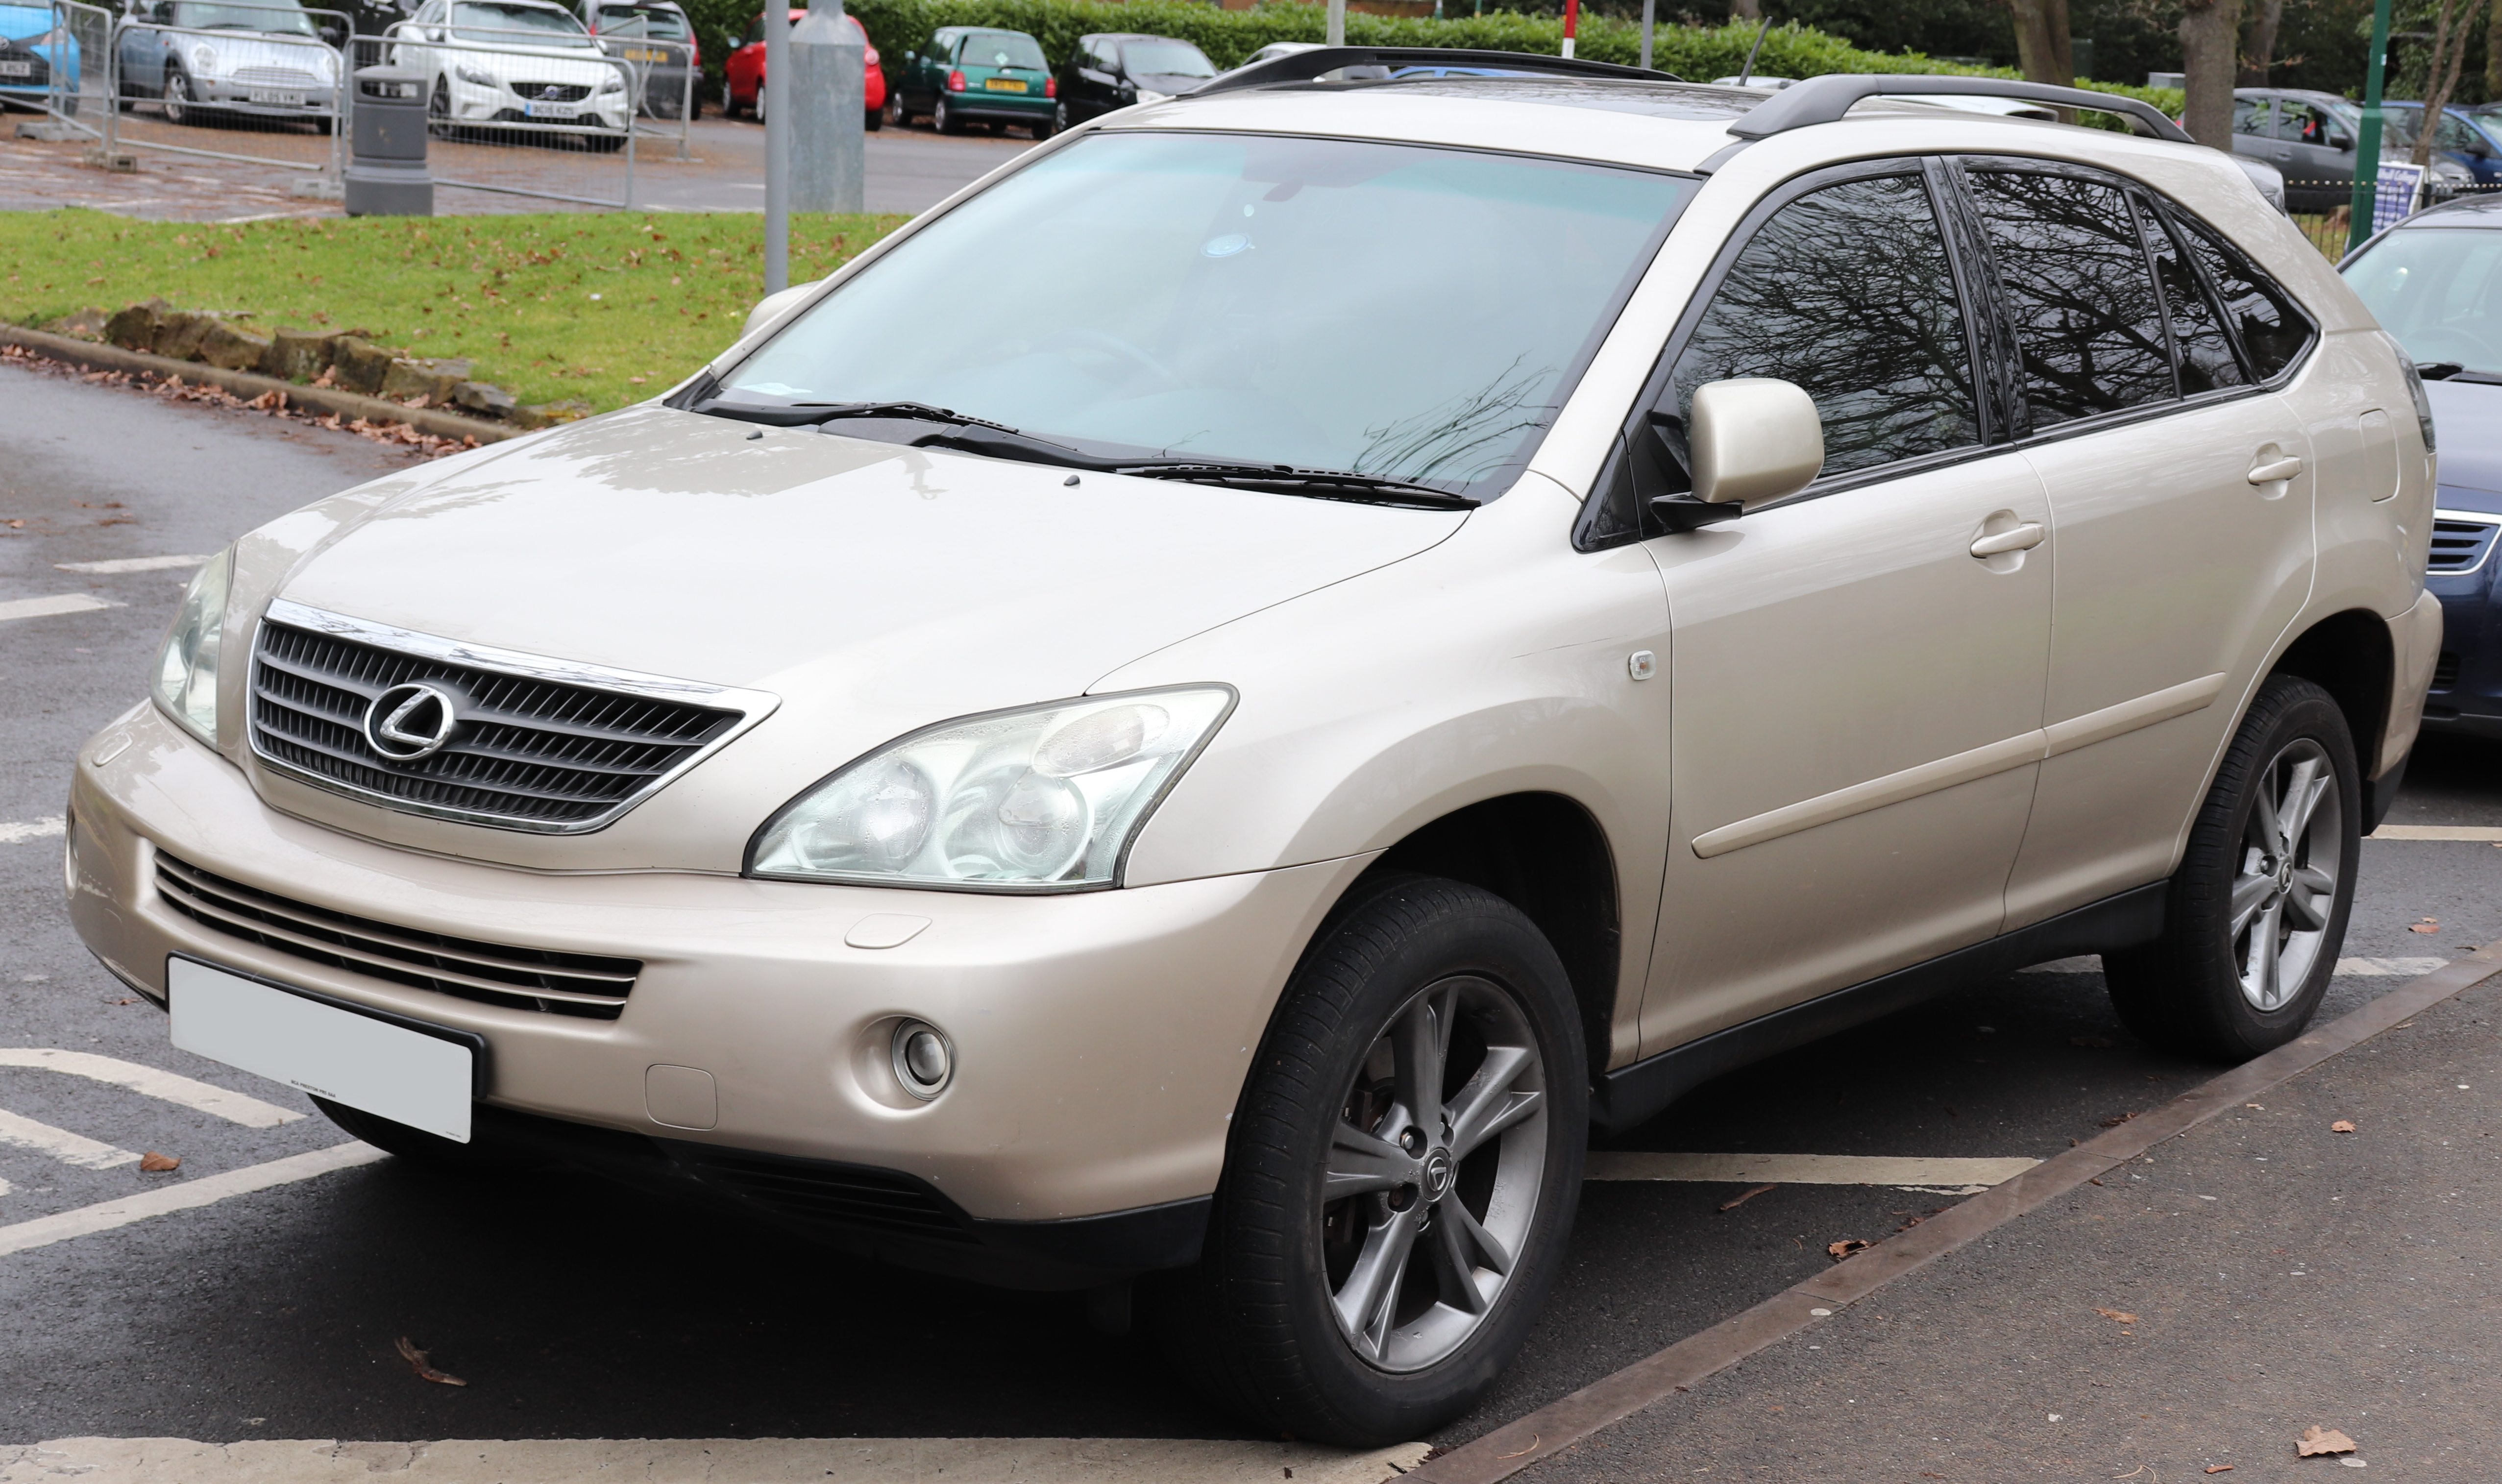 https://upload.wikimedia.org/wikipedia/commons/6/64/2005_Lexus_RX_400h_SE_CVT_3.3_Front.jpg